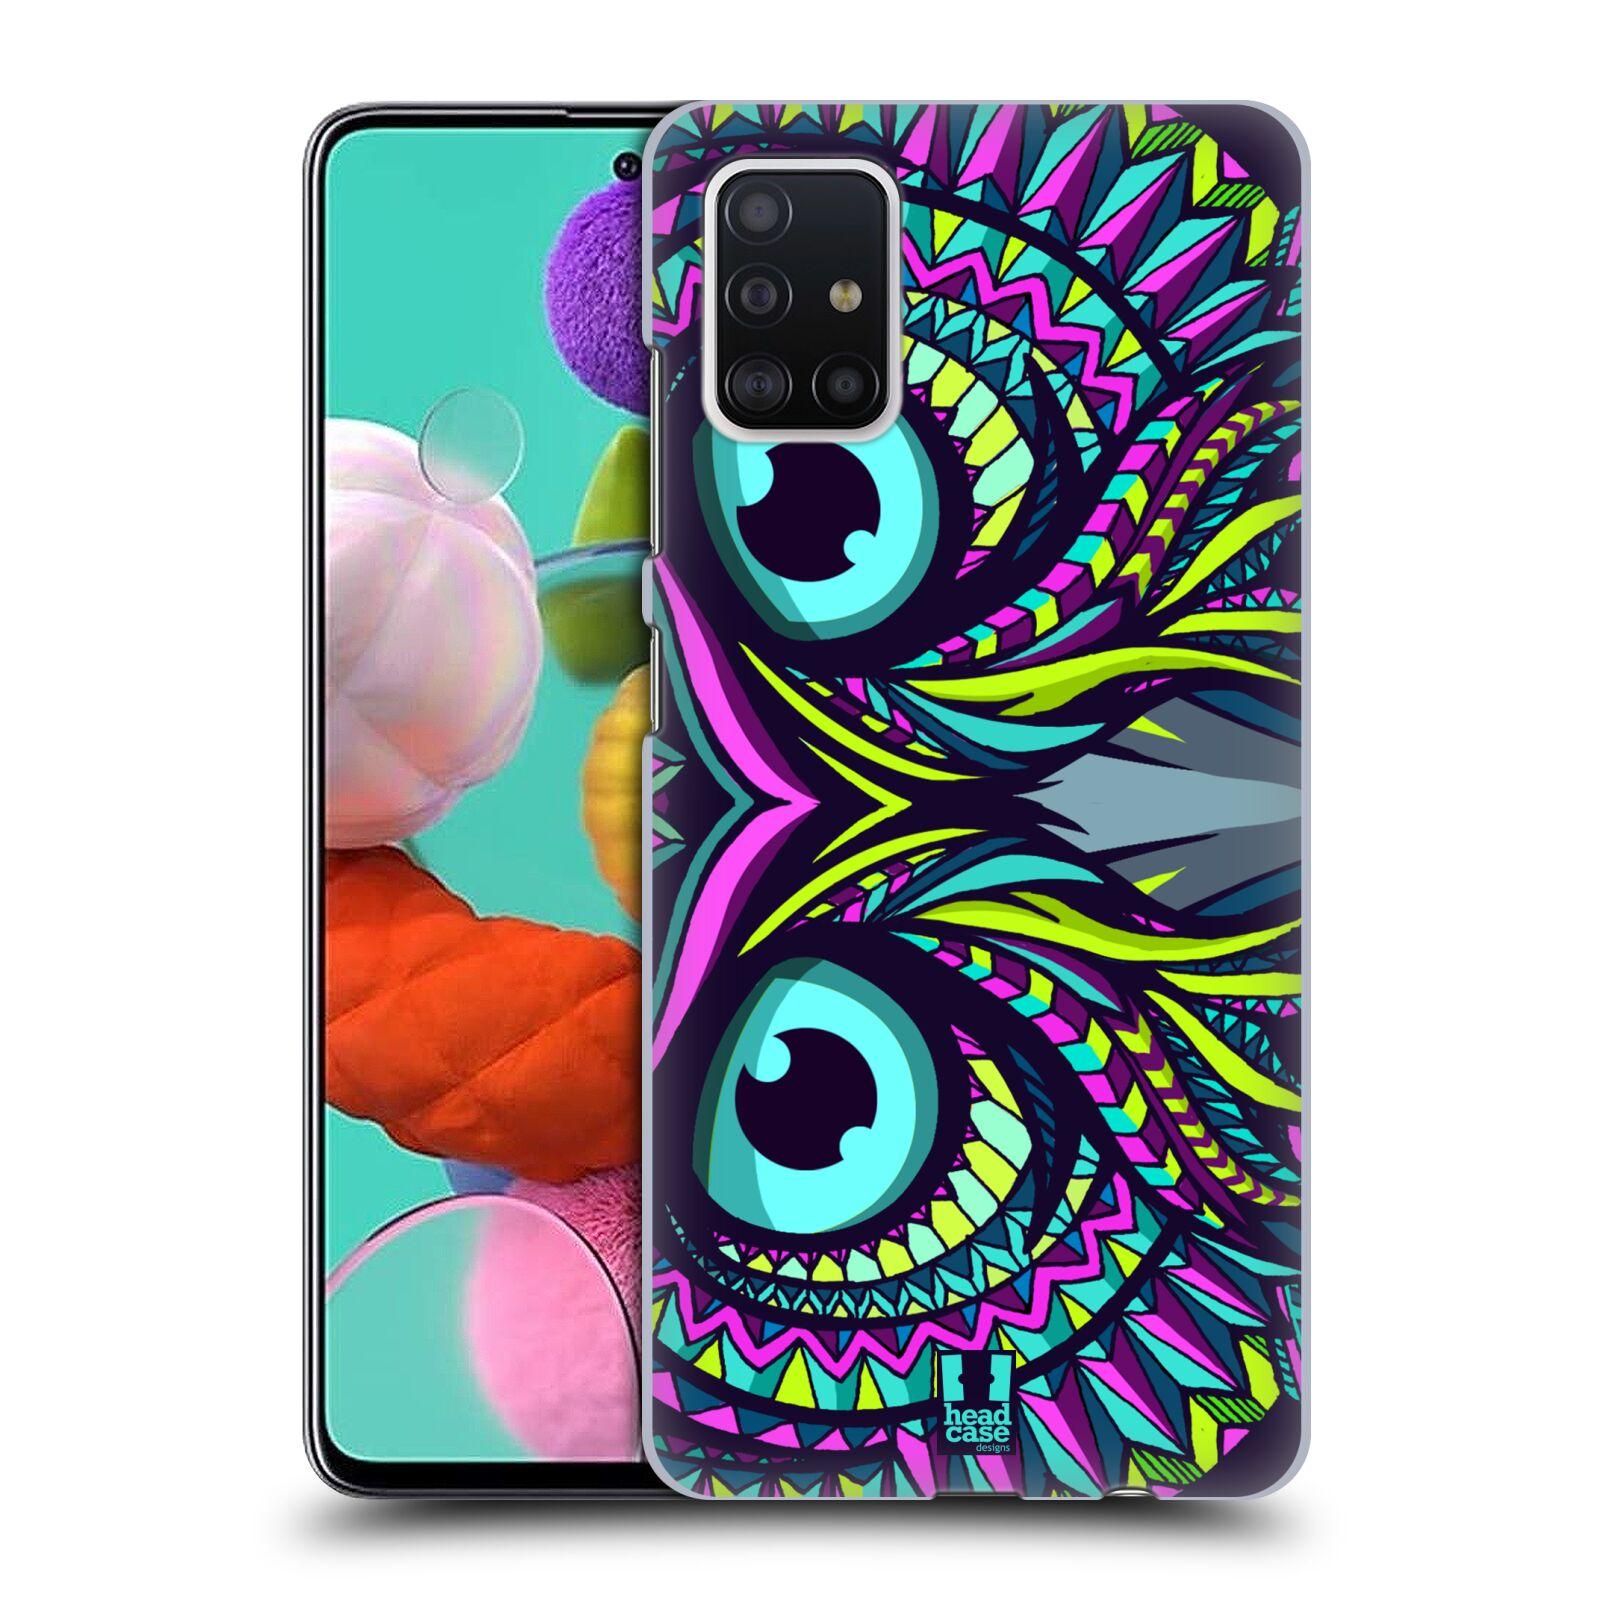 Plastové pouzdro na mobil Samsung Galaxy A51 - Head Case - AZTEC SOVA